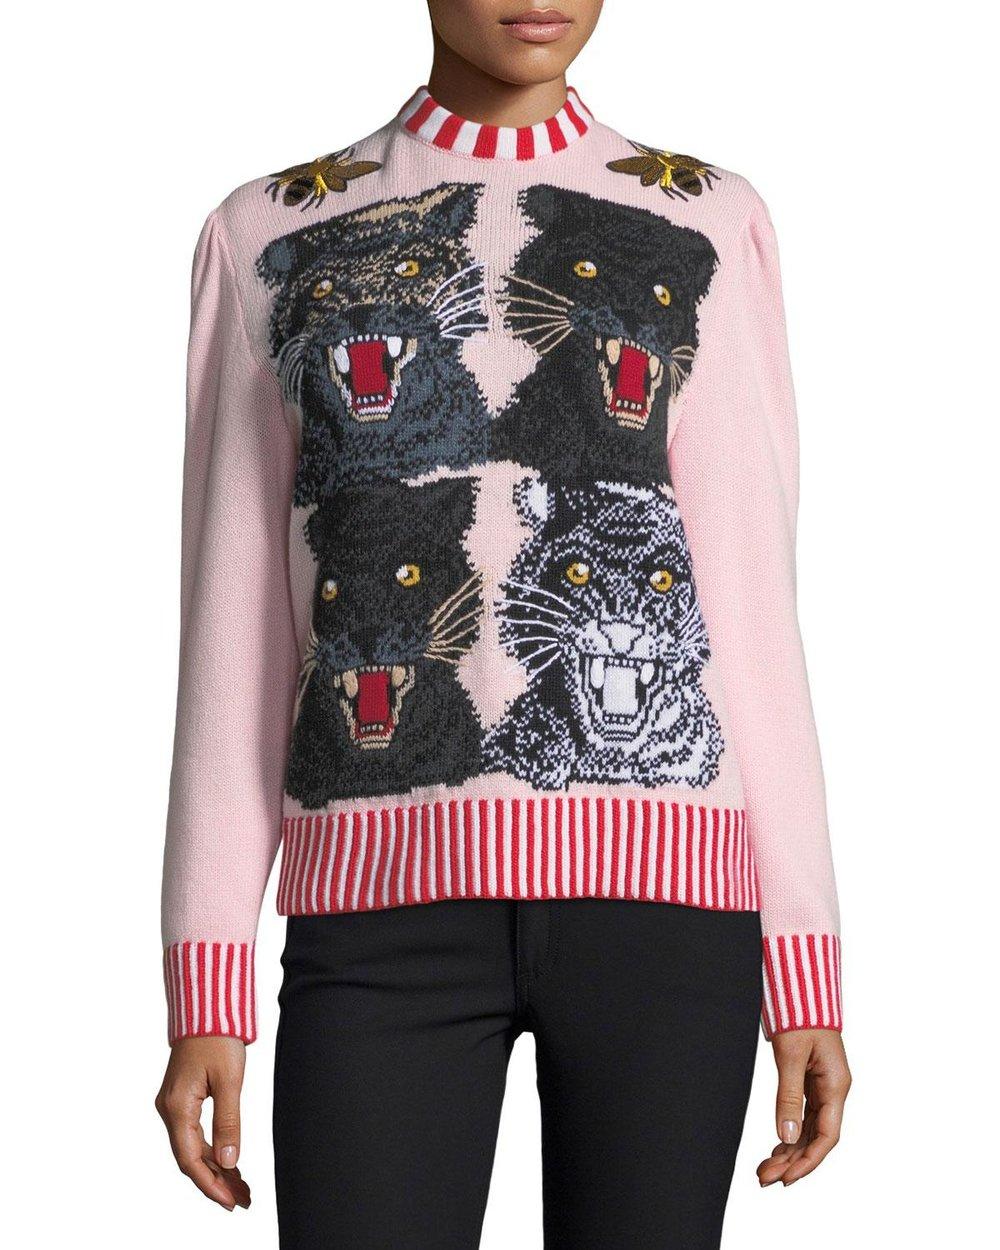 gucci-PINK-PATTERN-Tiger-Crewneck-Sweater.jpg